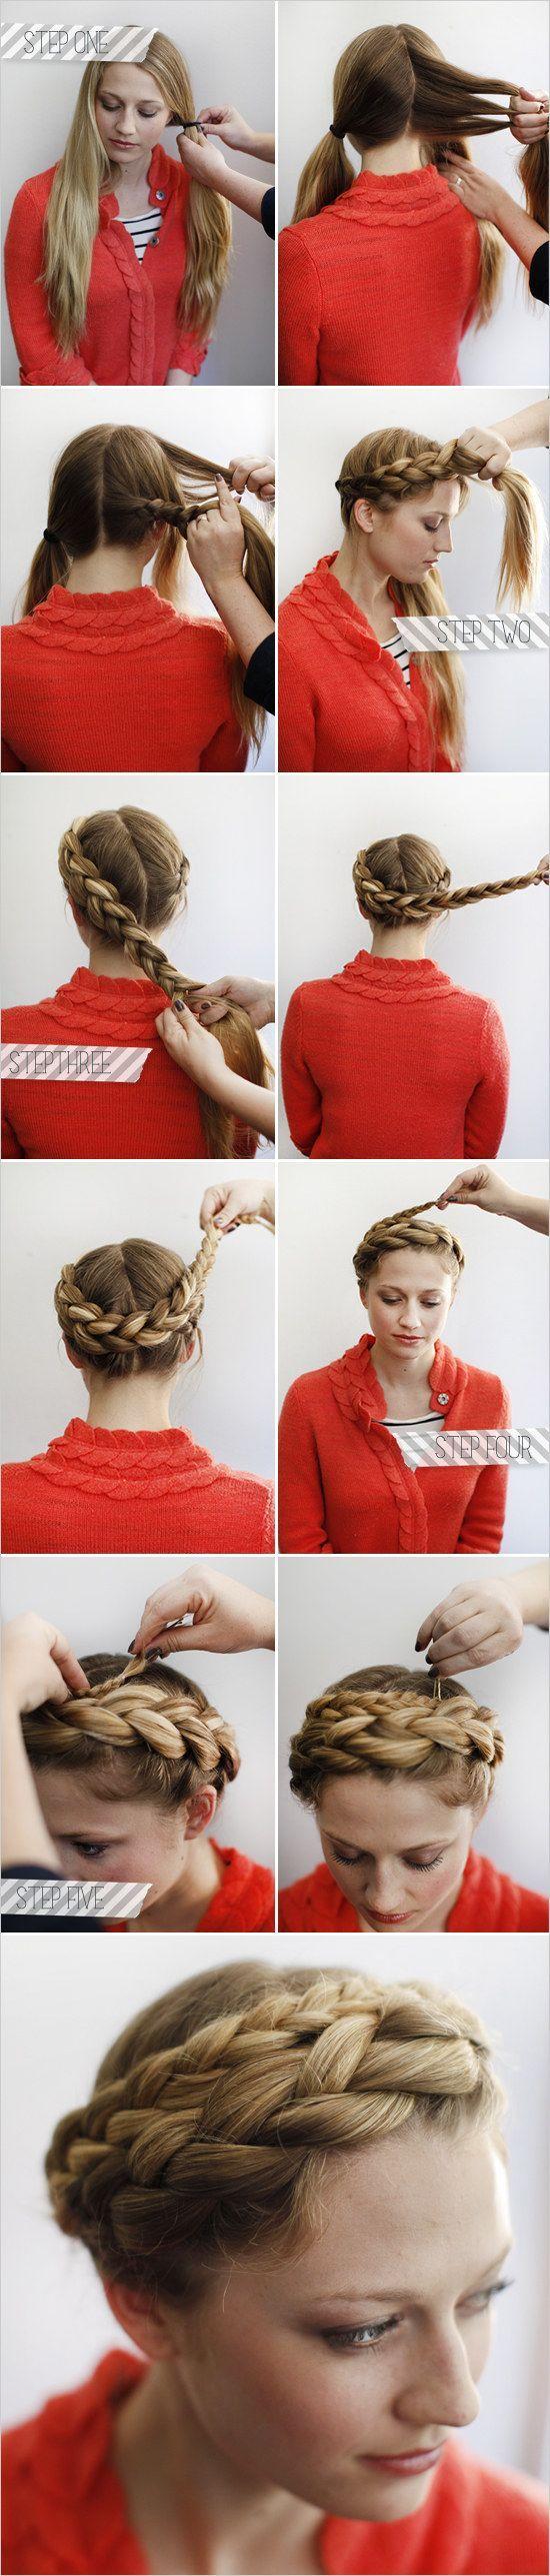 Crown Braids Redux | 23 Creative Braid Tutorials That Are Deceptively Easy